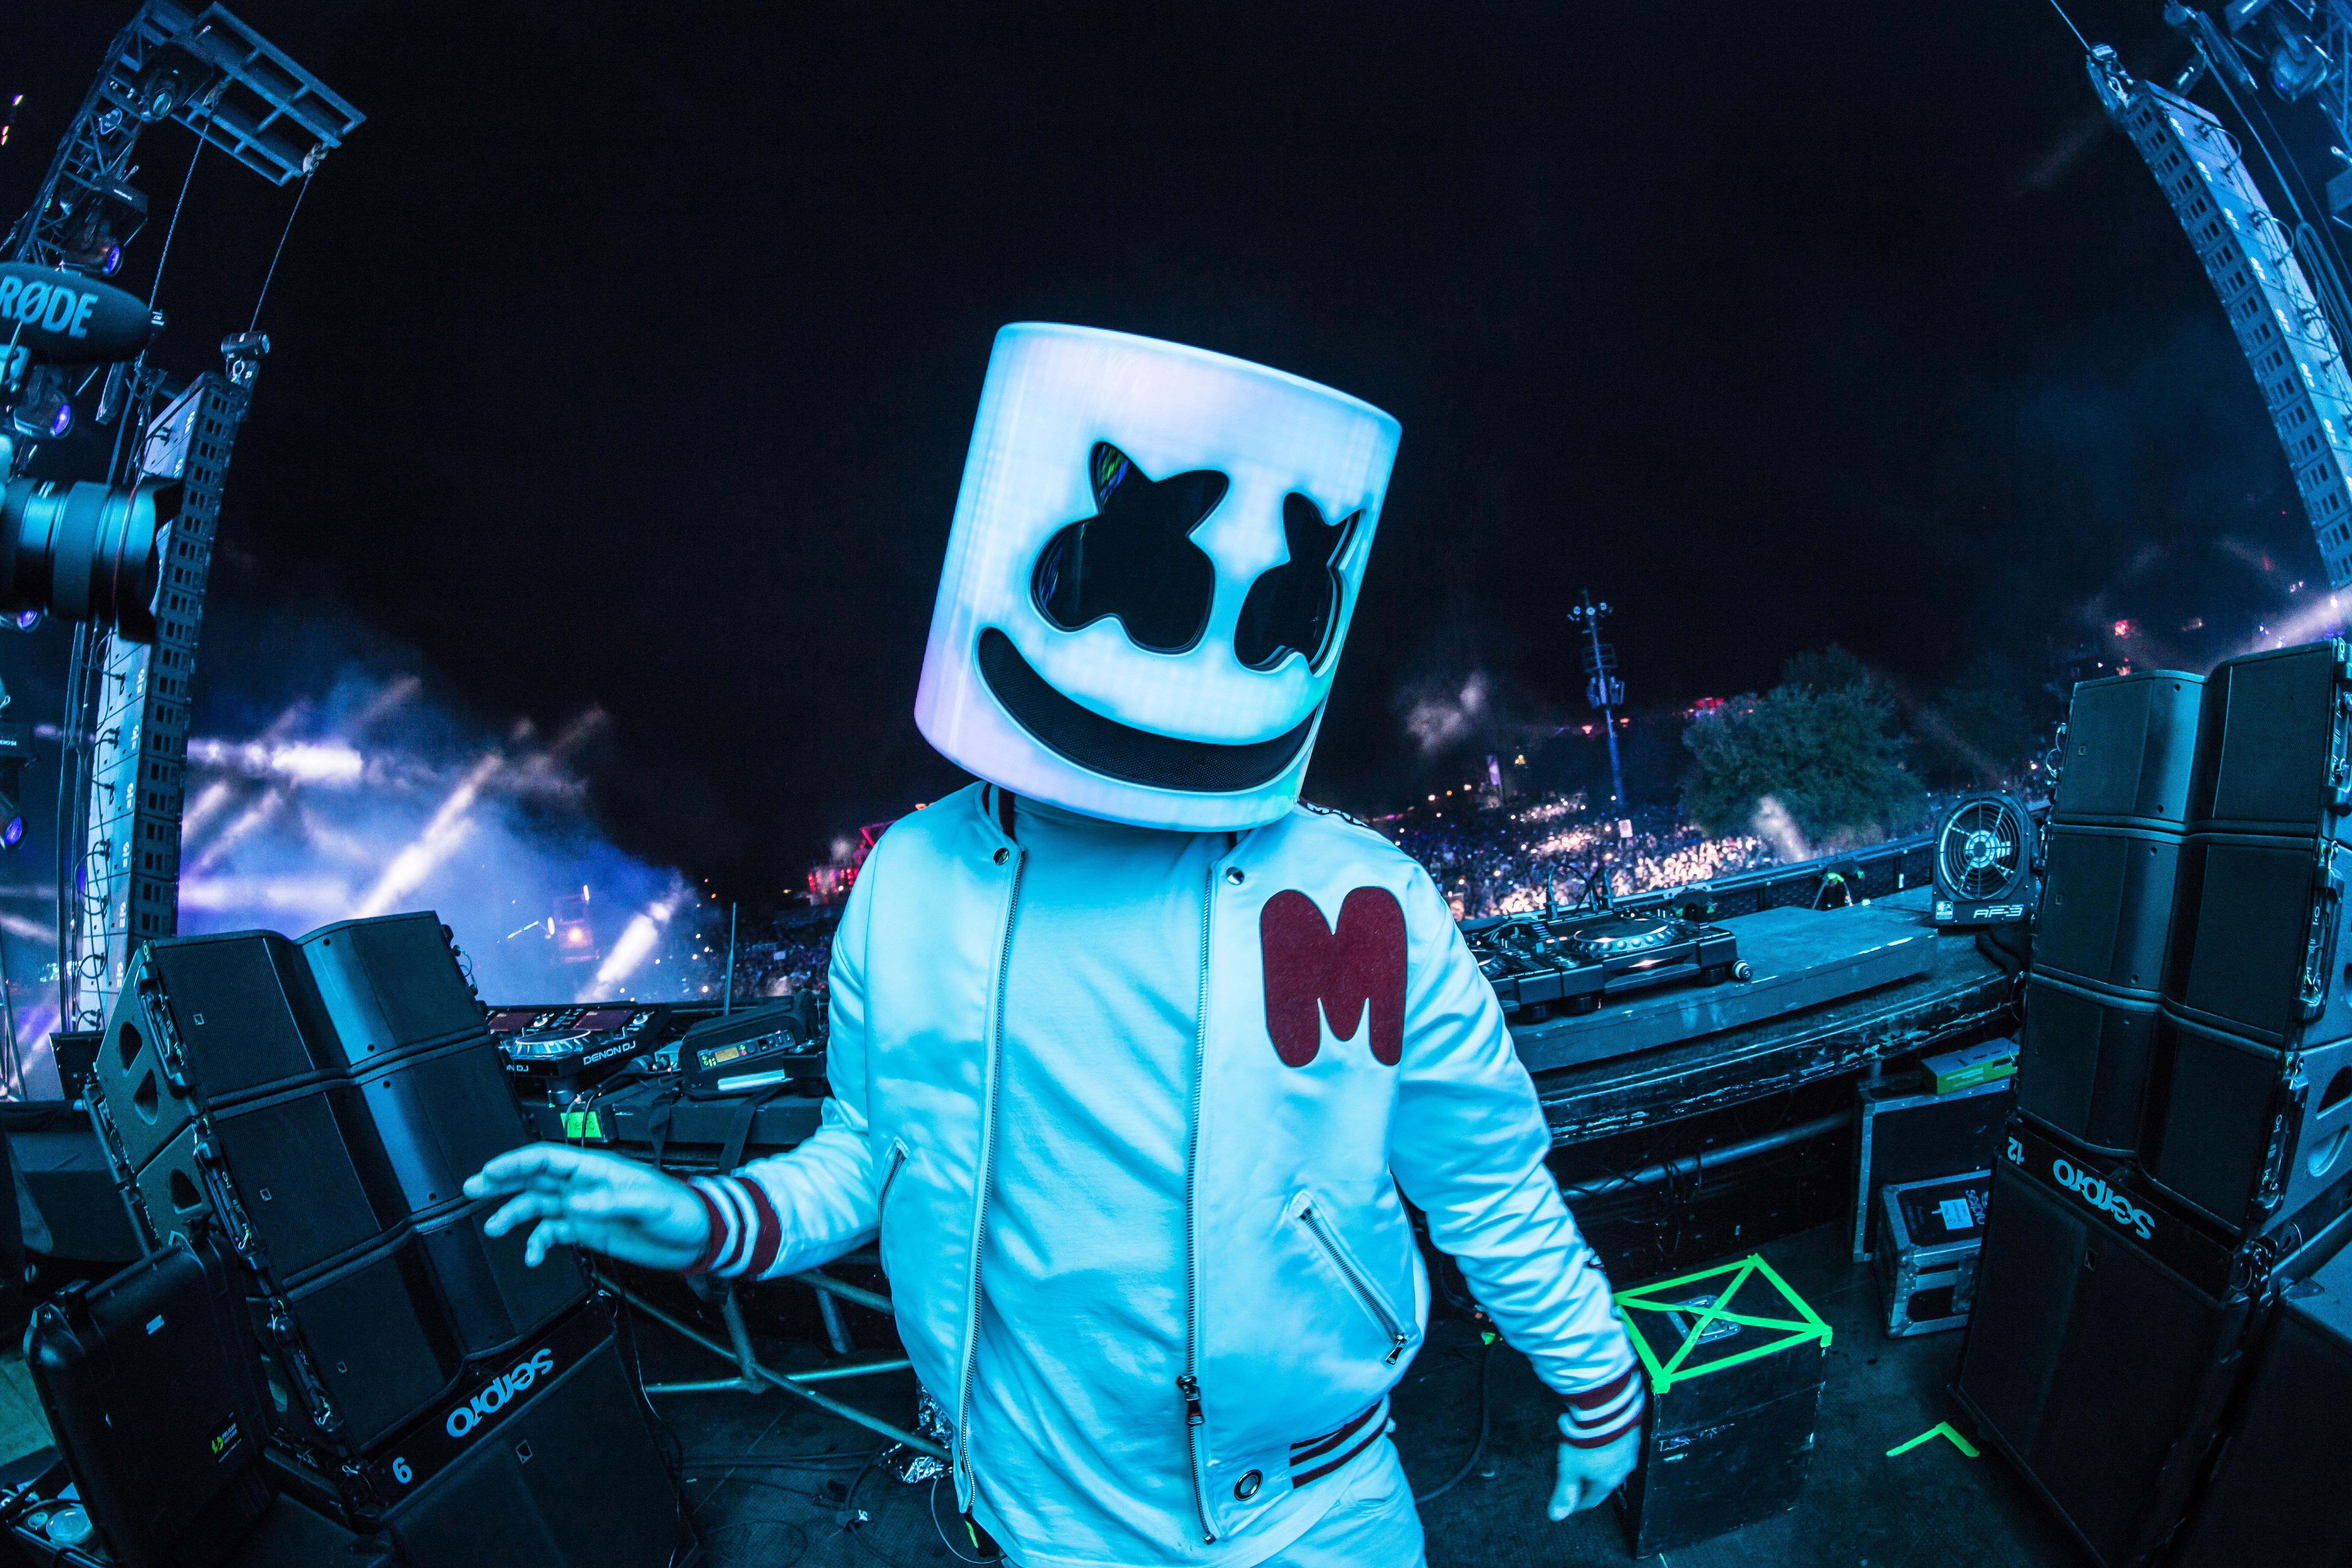 Marshmello 2018 On Stage Live Dj 5k, HD Music, 4k